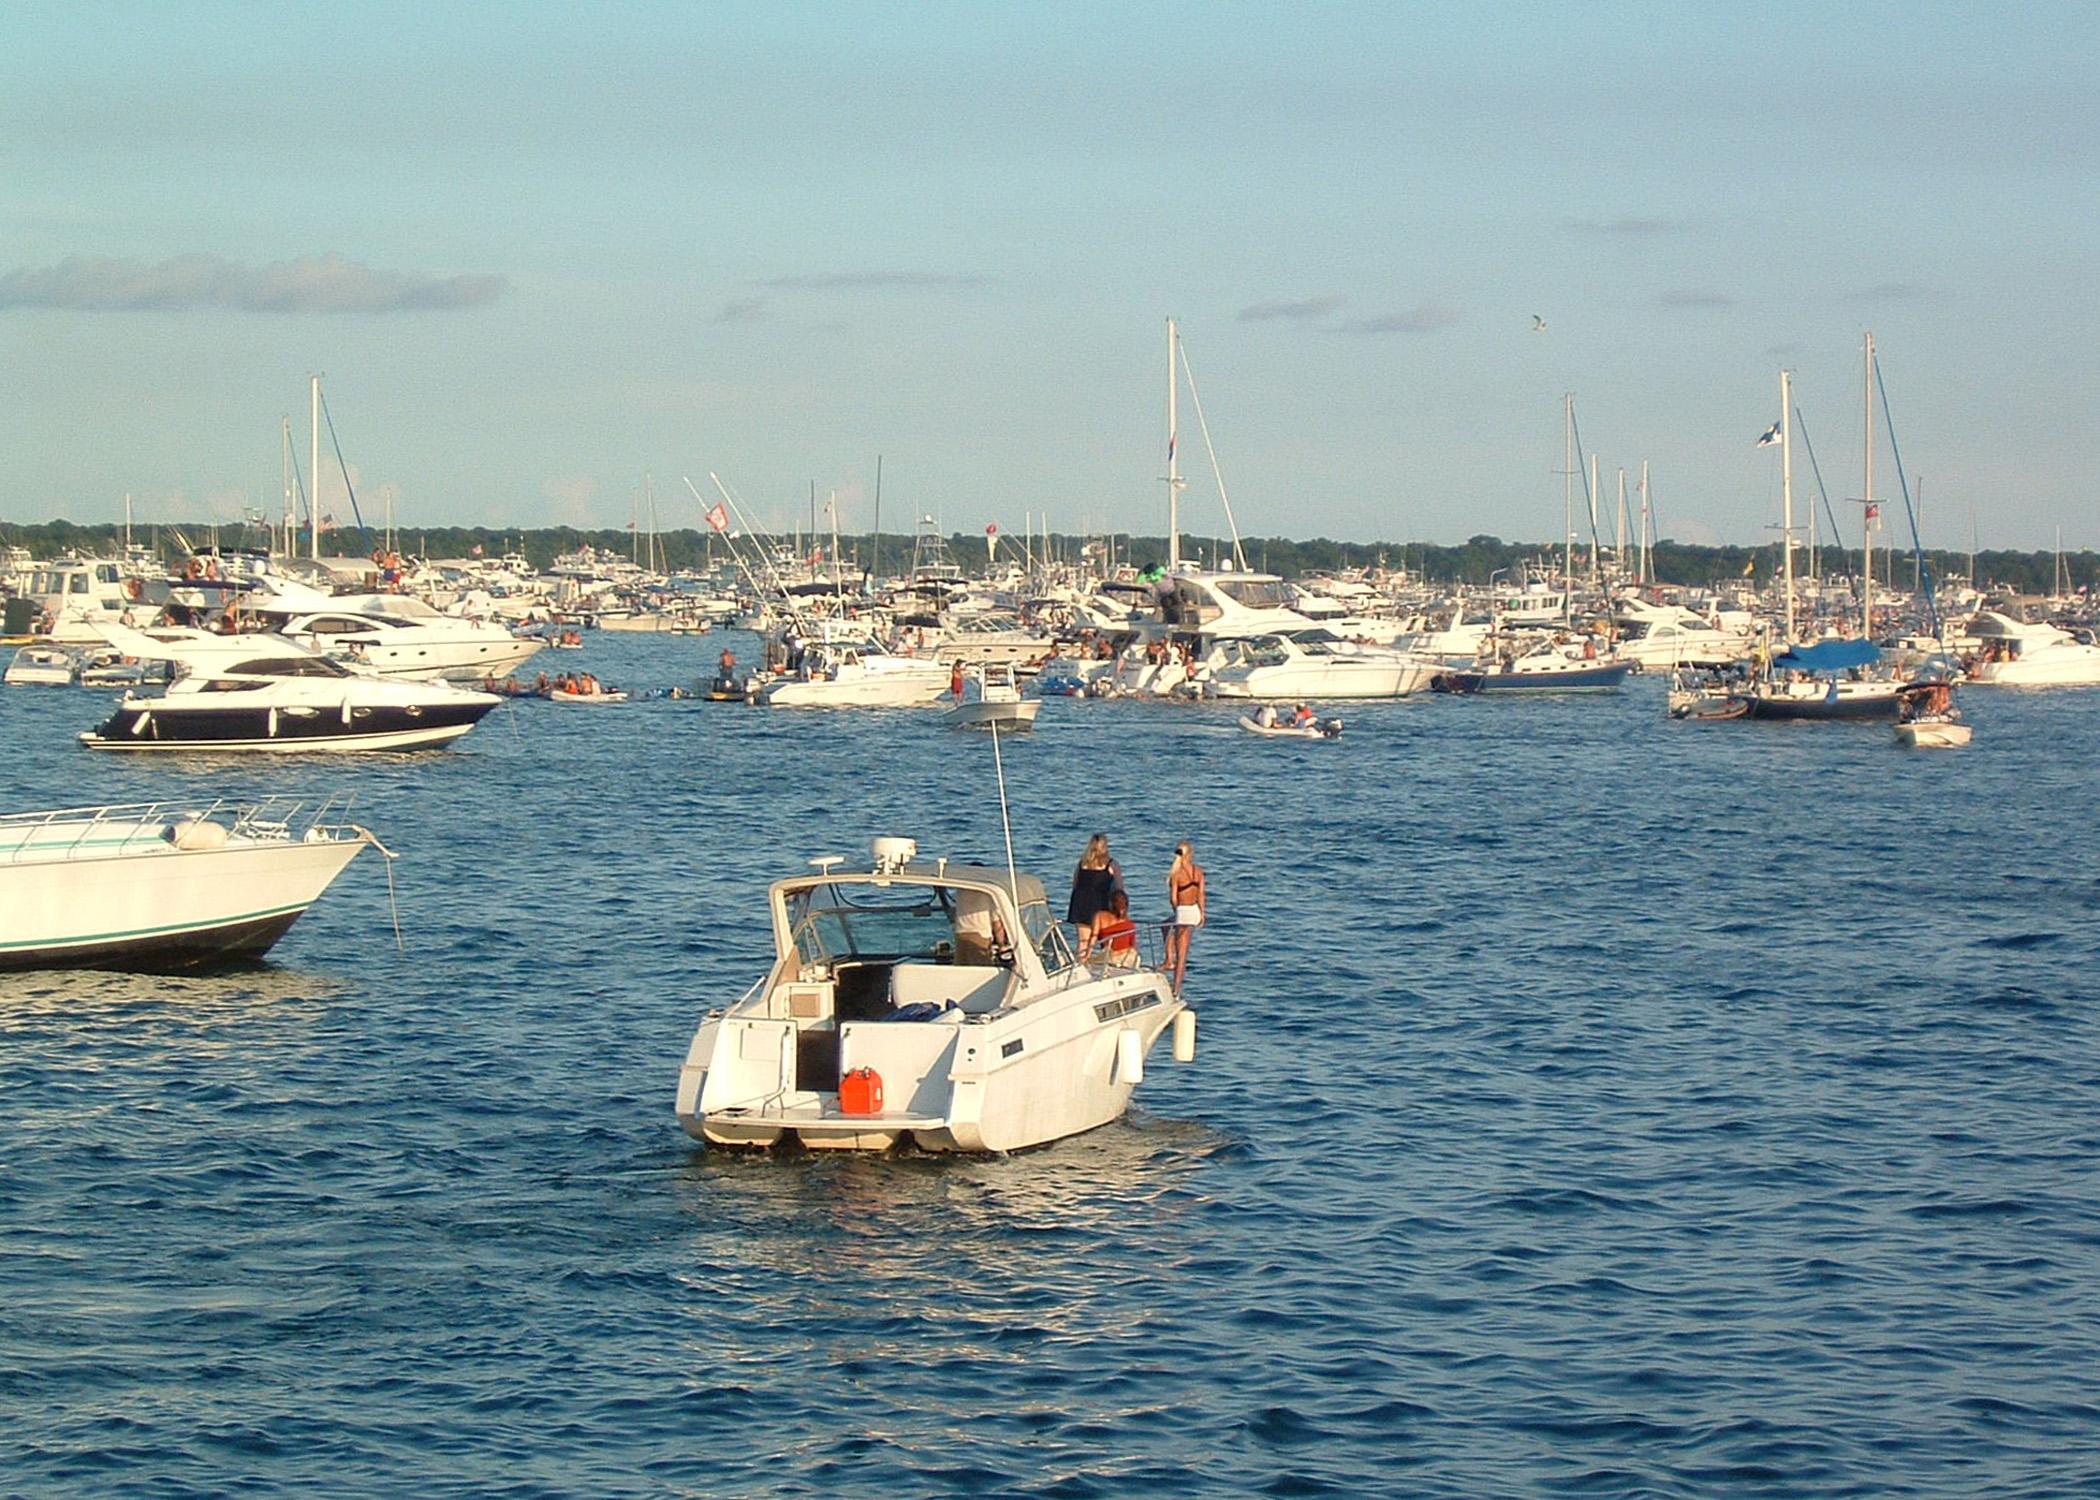 boats keeping ecosystem safe